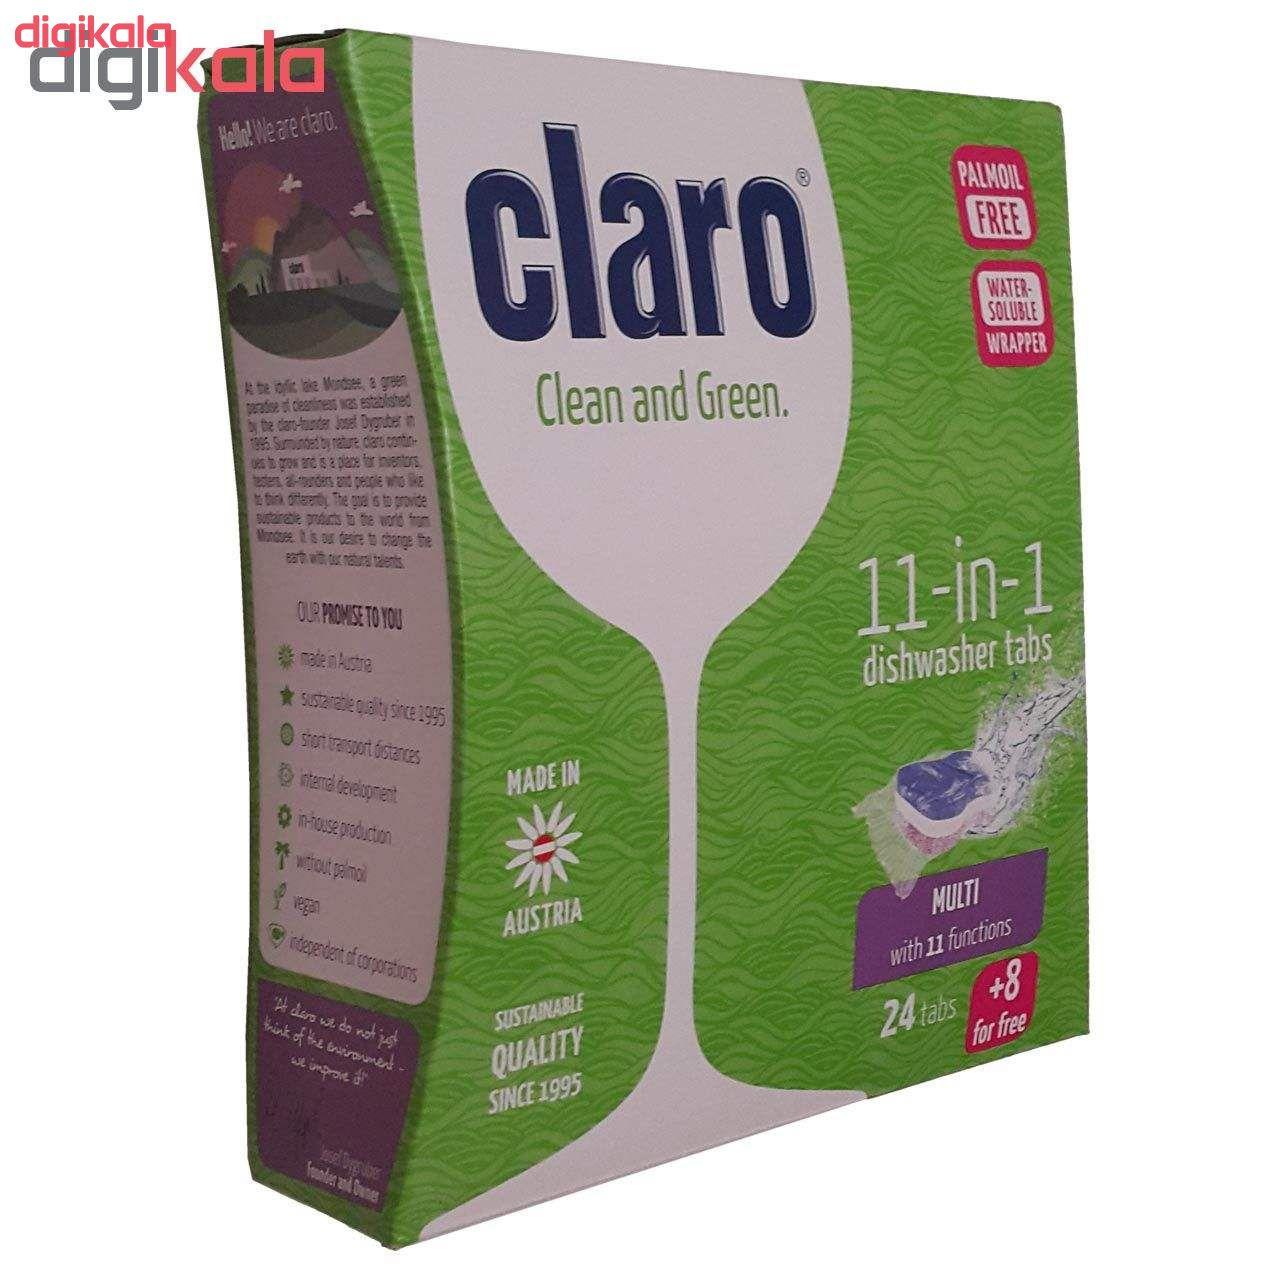 قرص ماشین ظرفشویی کلارو مدل 11in1 بسته 32 عددی main 1 1